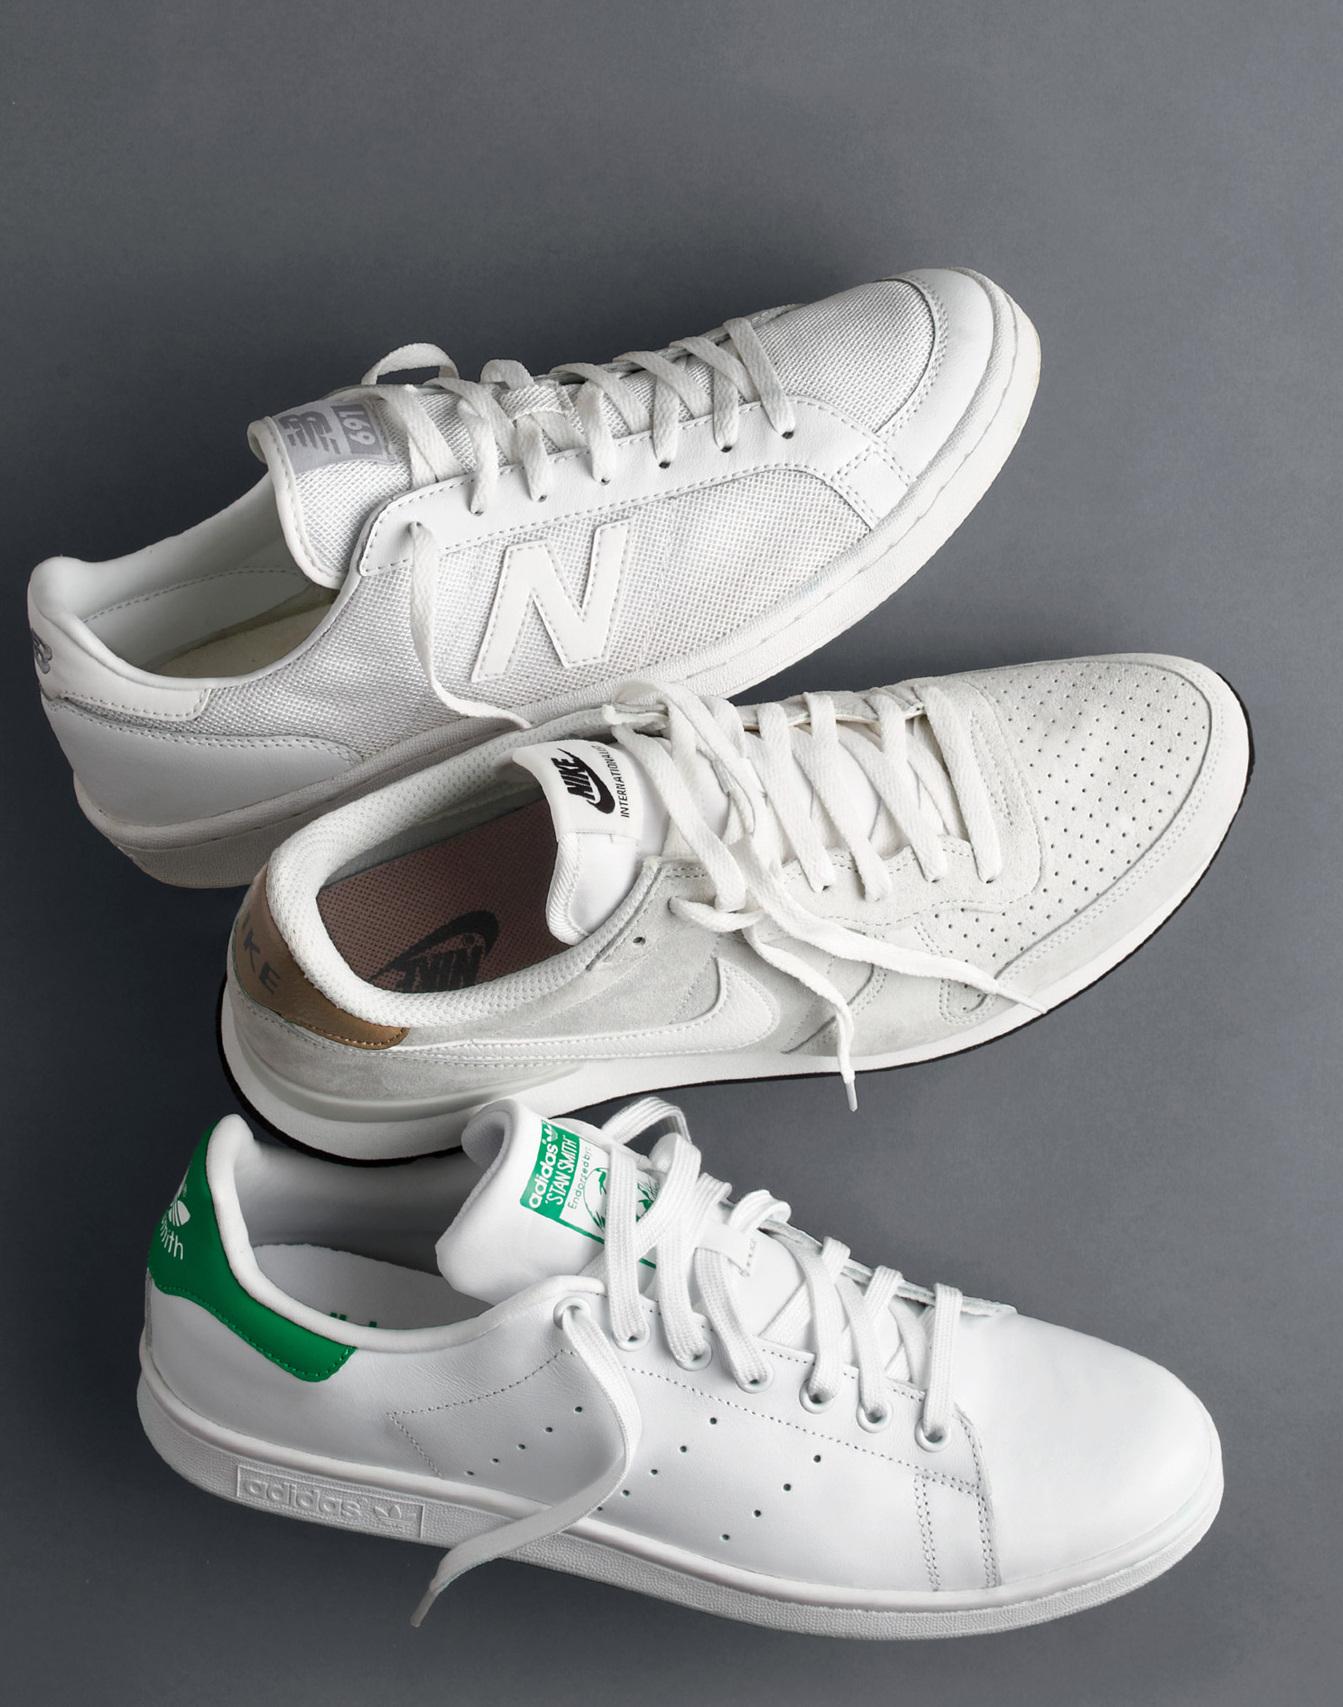 Adidas_Nike_Newbalance_still_photography.jpg